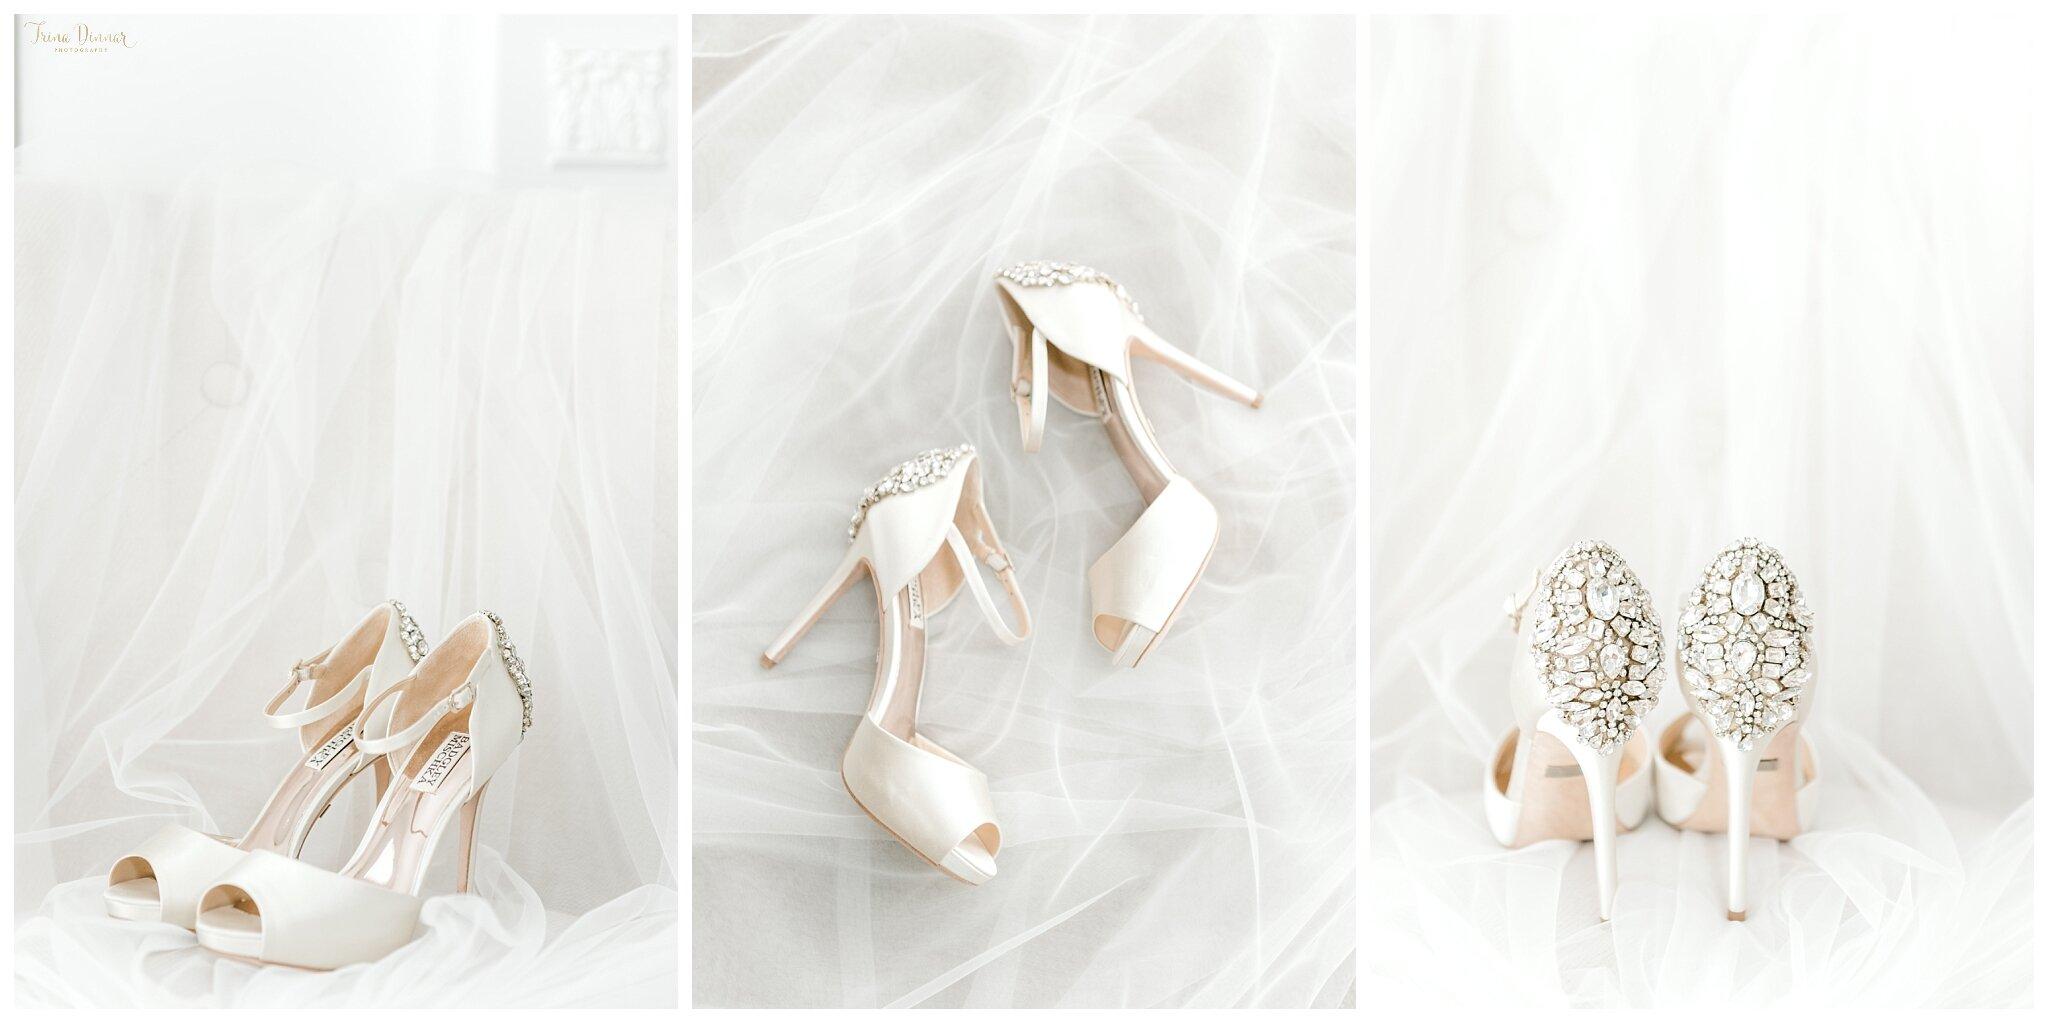 Bridal Wedding Day Accessories Portland Maine